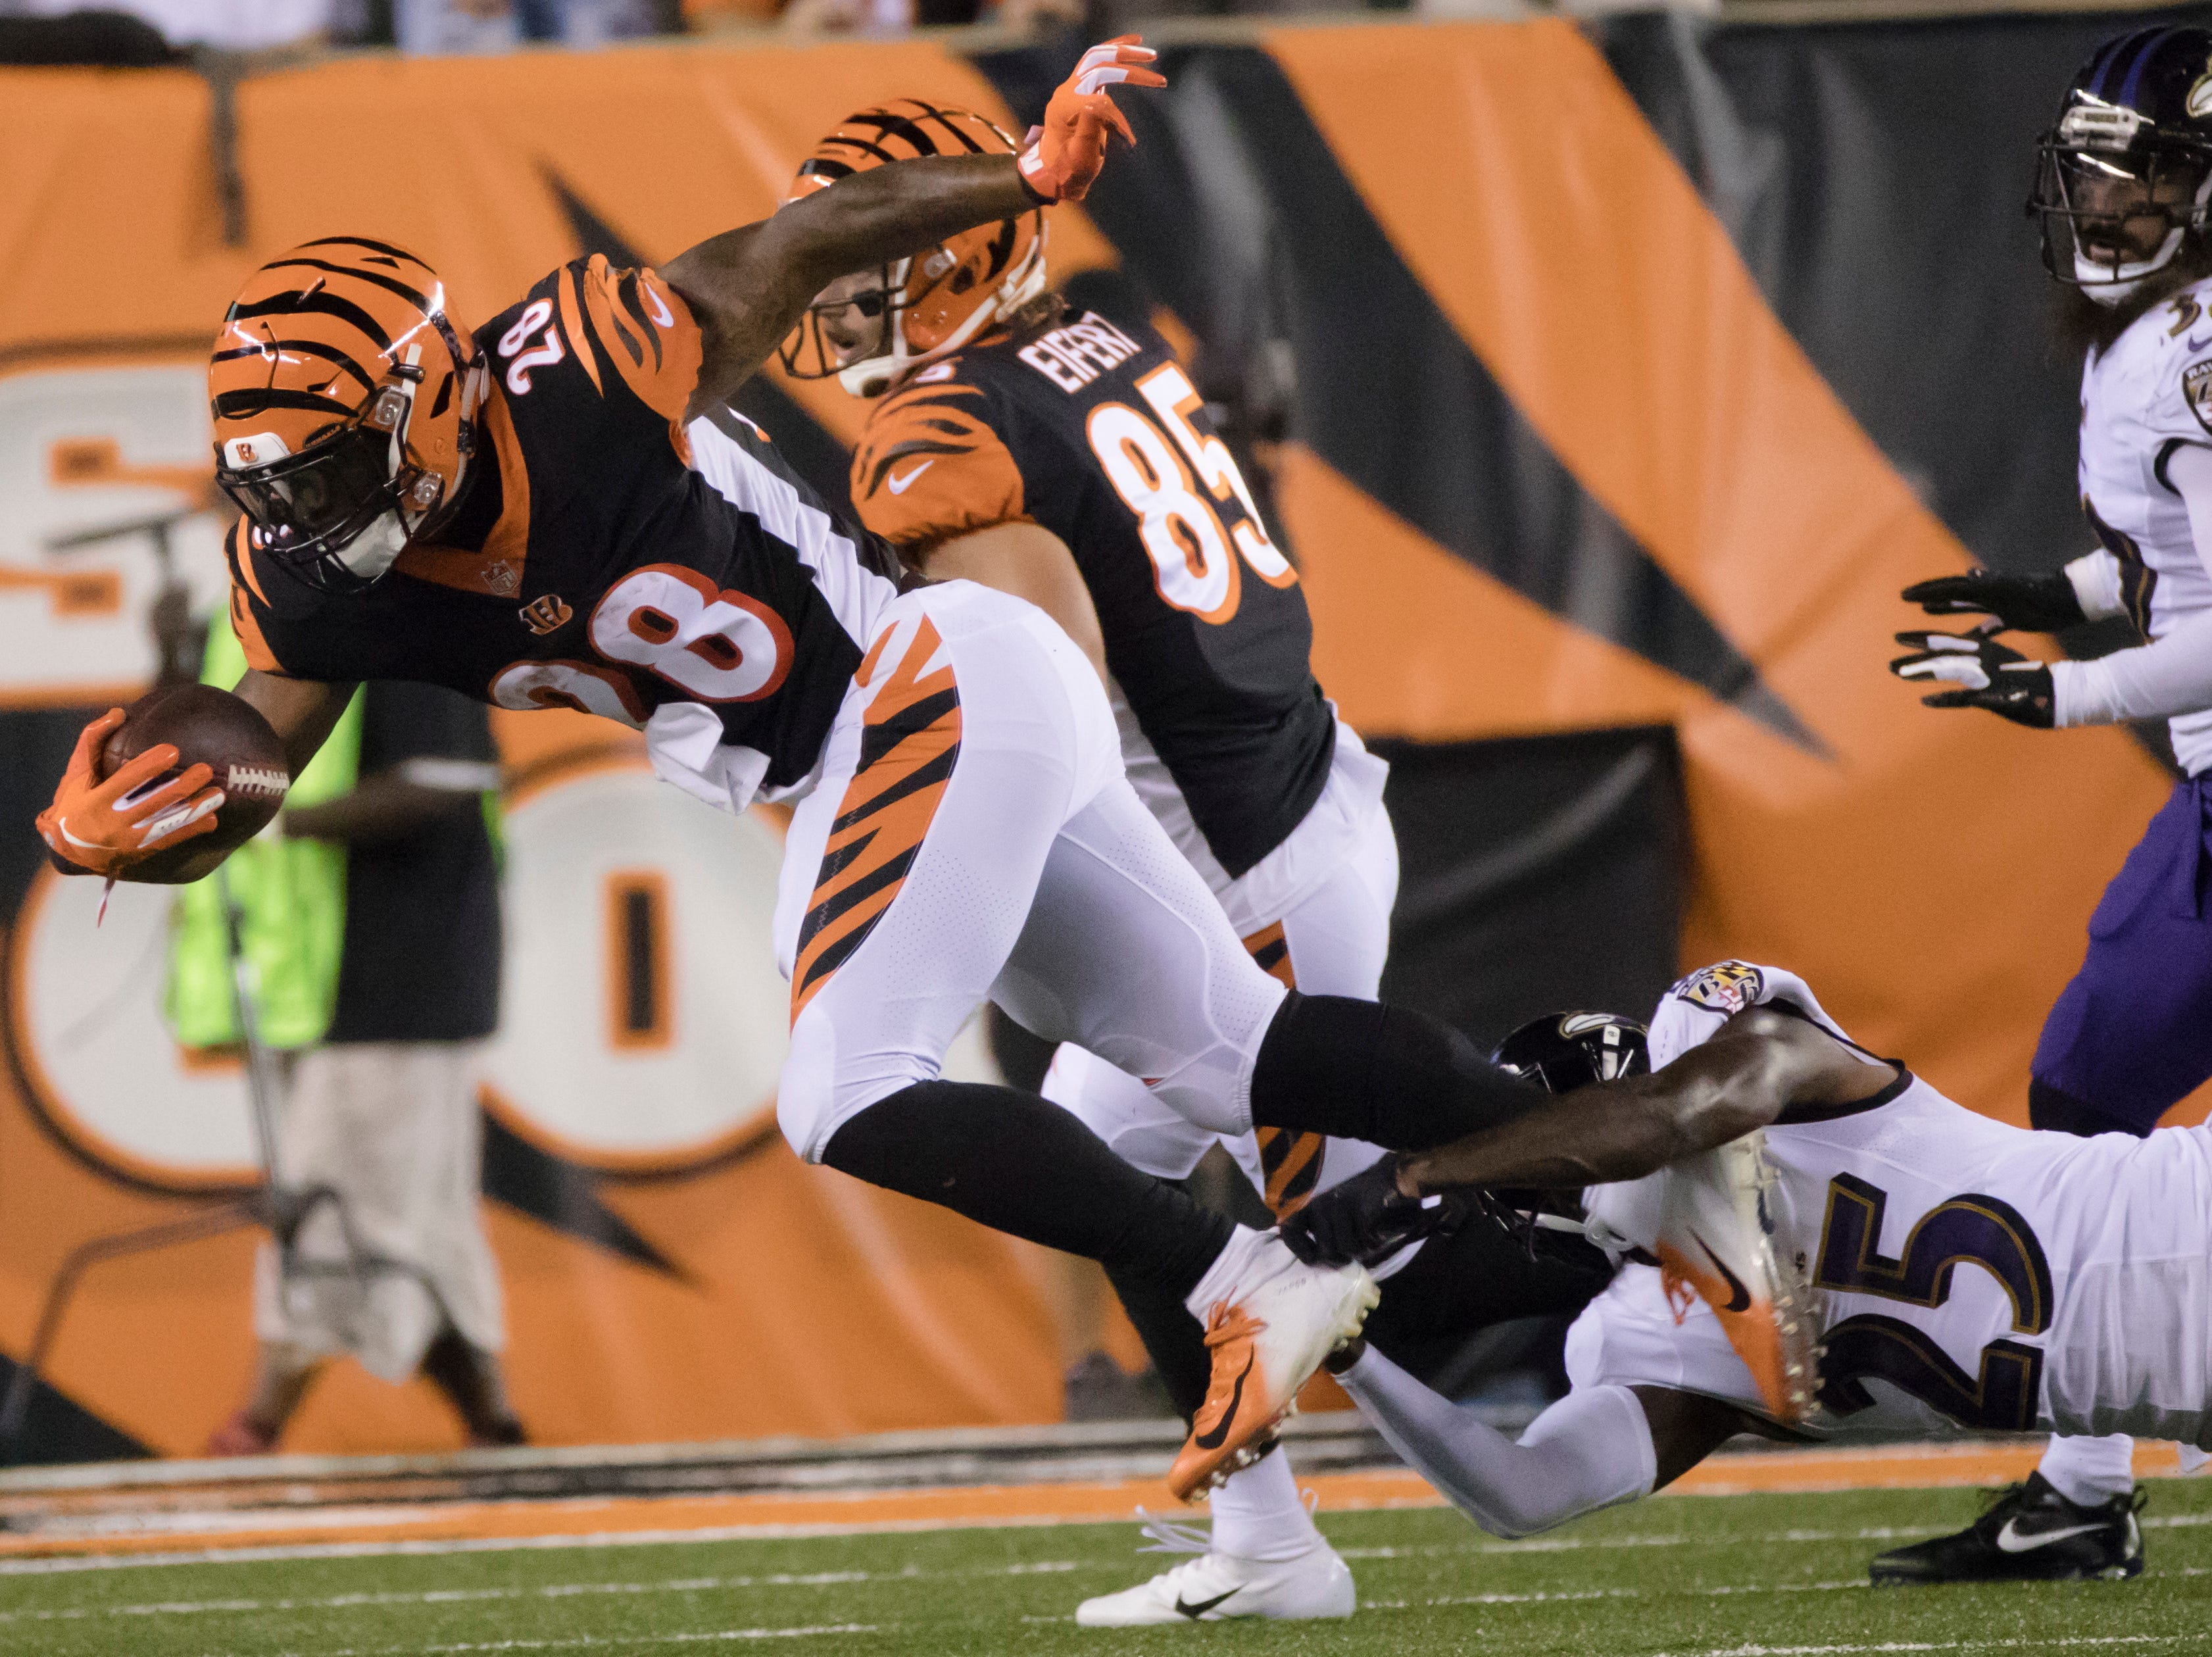 Baltimore Ravens cornerback Tavon Young (25) tackles Cincinnati Bengals running back Joe Mixon (28) during the Week 2 NFL game between the Cincinnati Bengals and the Baltimore Ravens, Thursday, Sept. 13, 2018, at Paul Brown Stadium in Cincinnati.